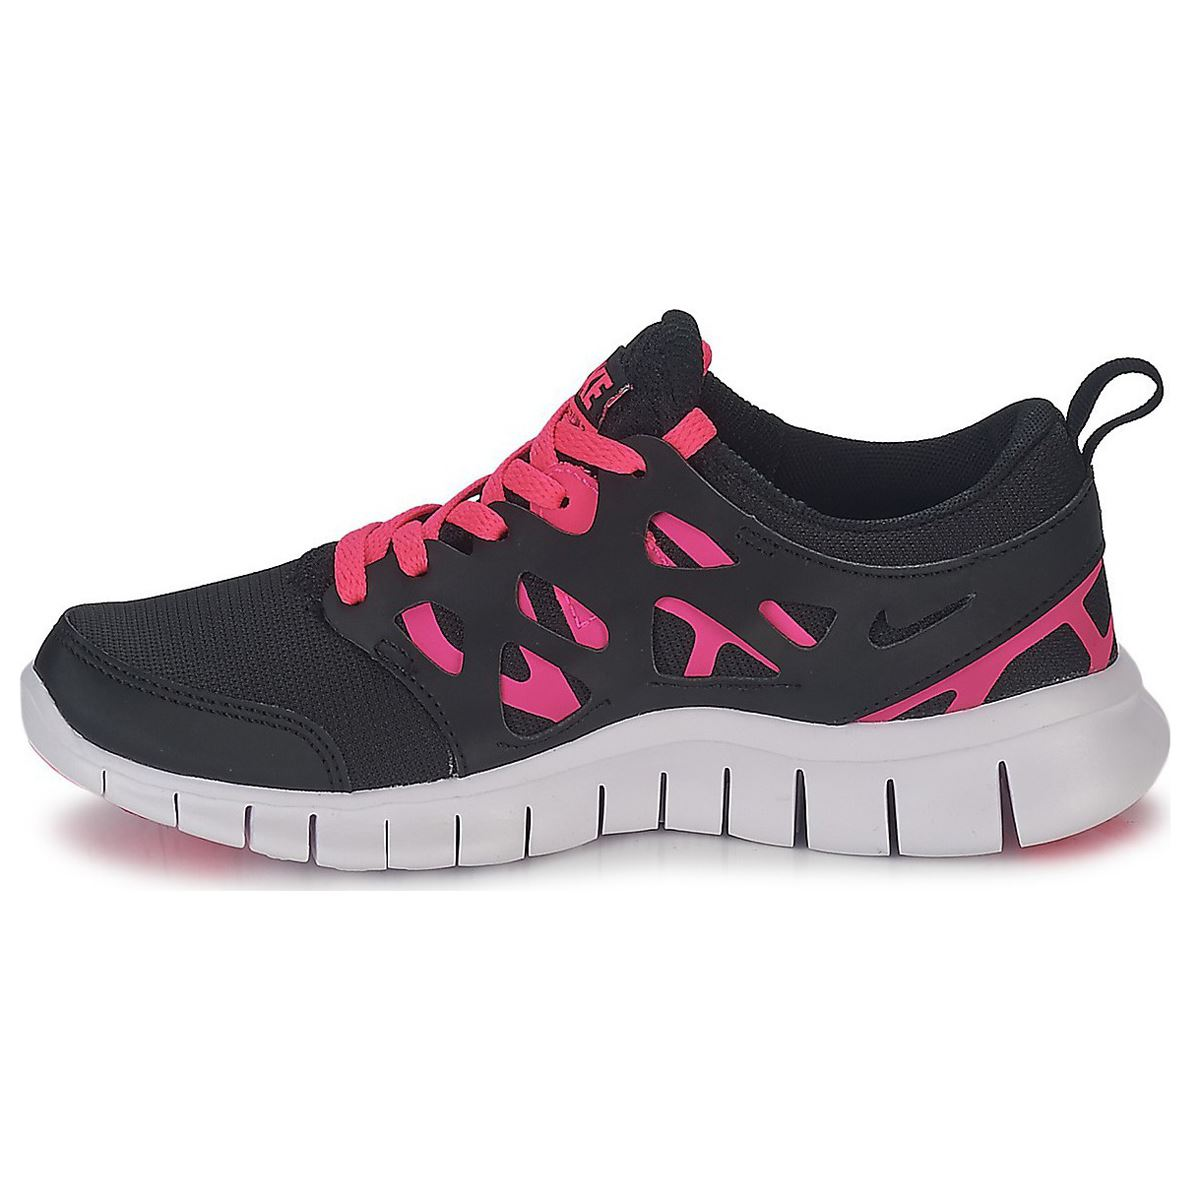 the best attitude 26807 0a173 Free Run 5.0 Zig Zag Cheetah Leopard Nike Shoes